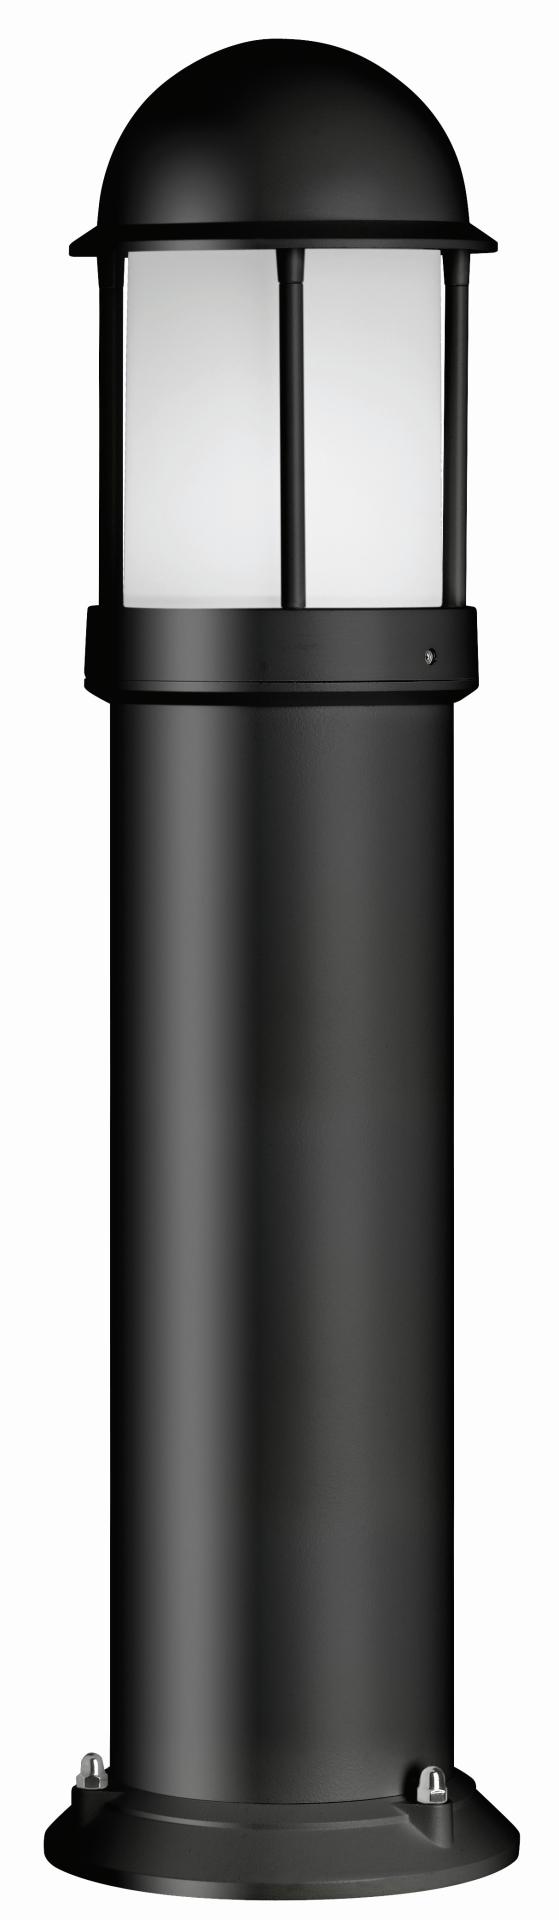 Standleuchte lang Typ 1034